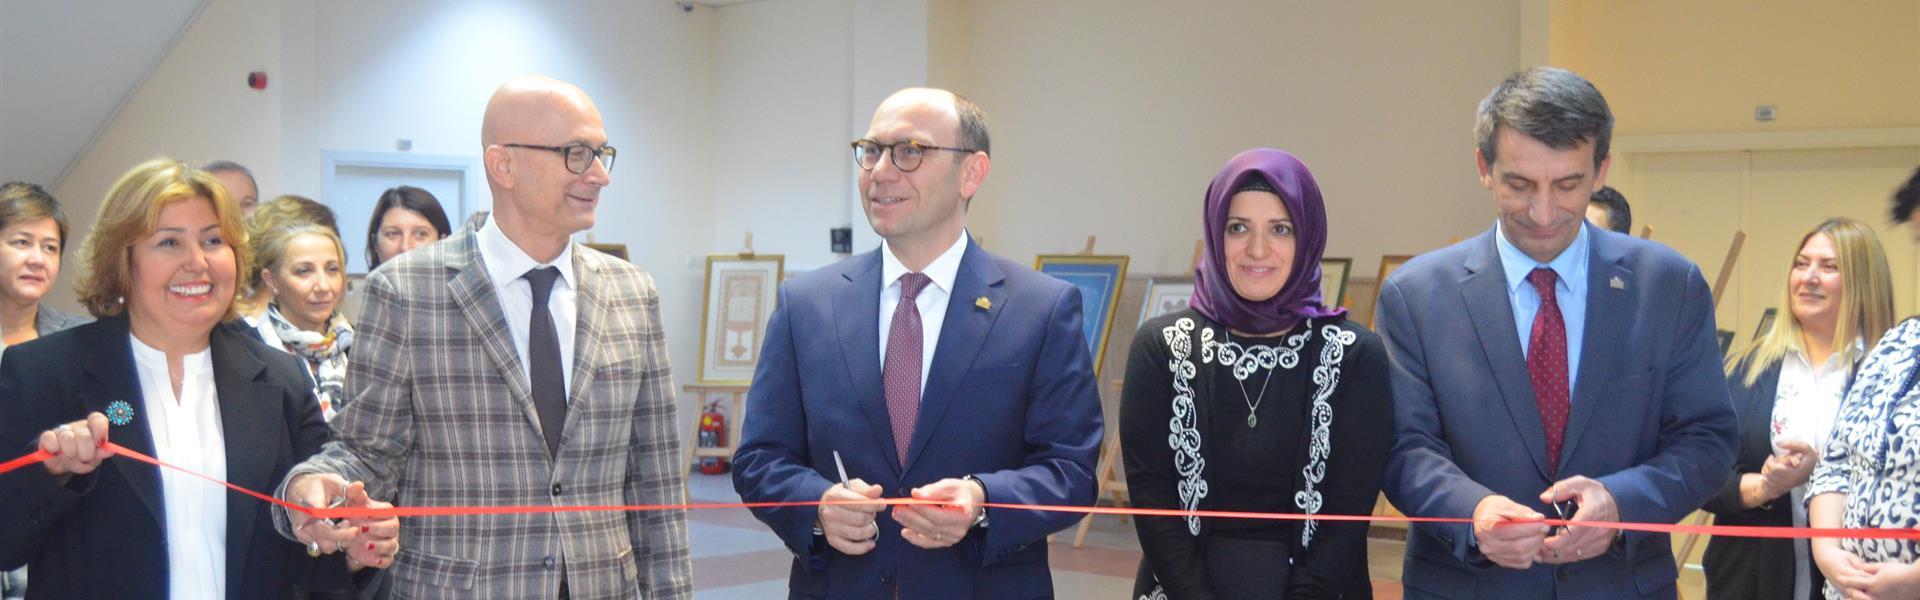 forensic forensicsciences forensicmedicine legalmedicine istanbul istanbuluniversity